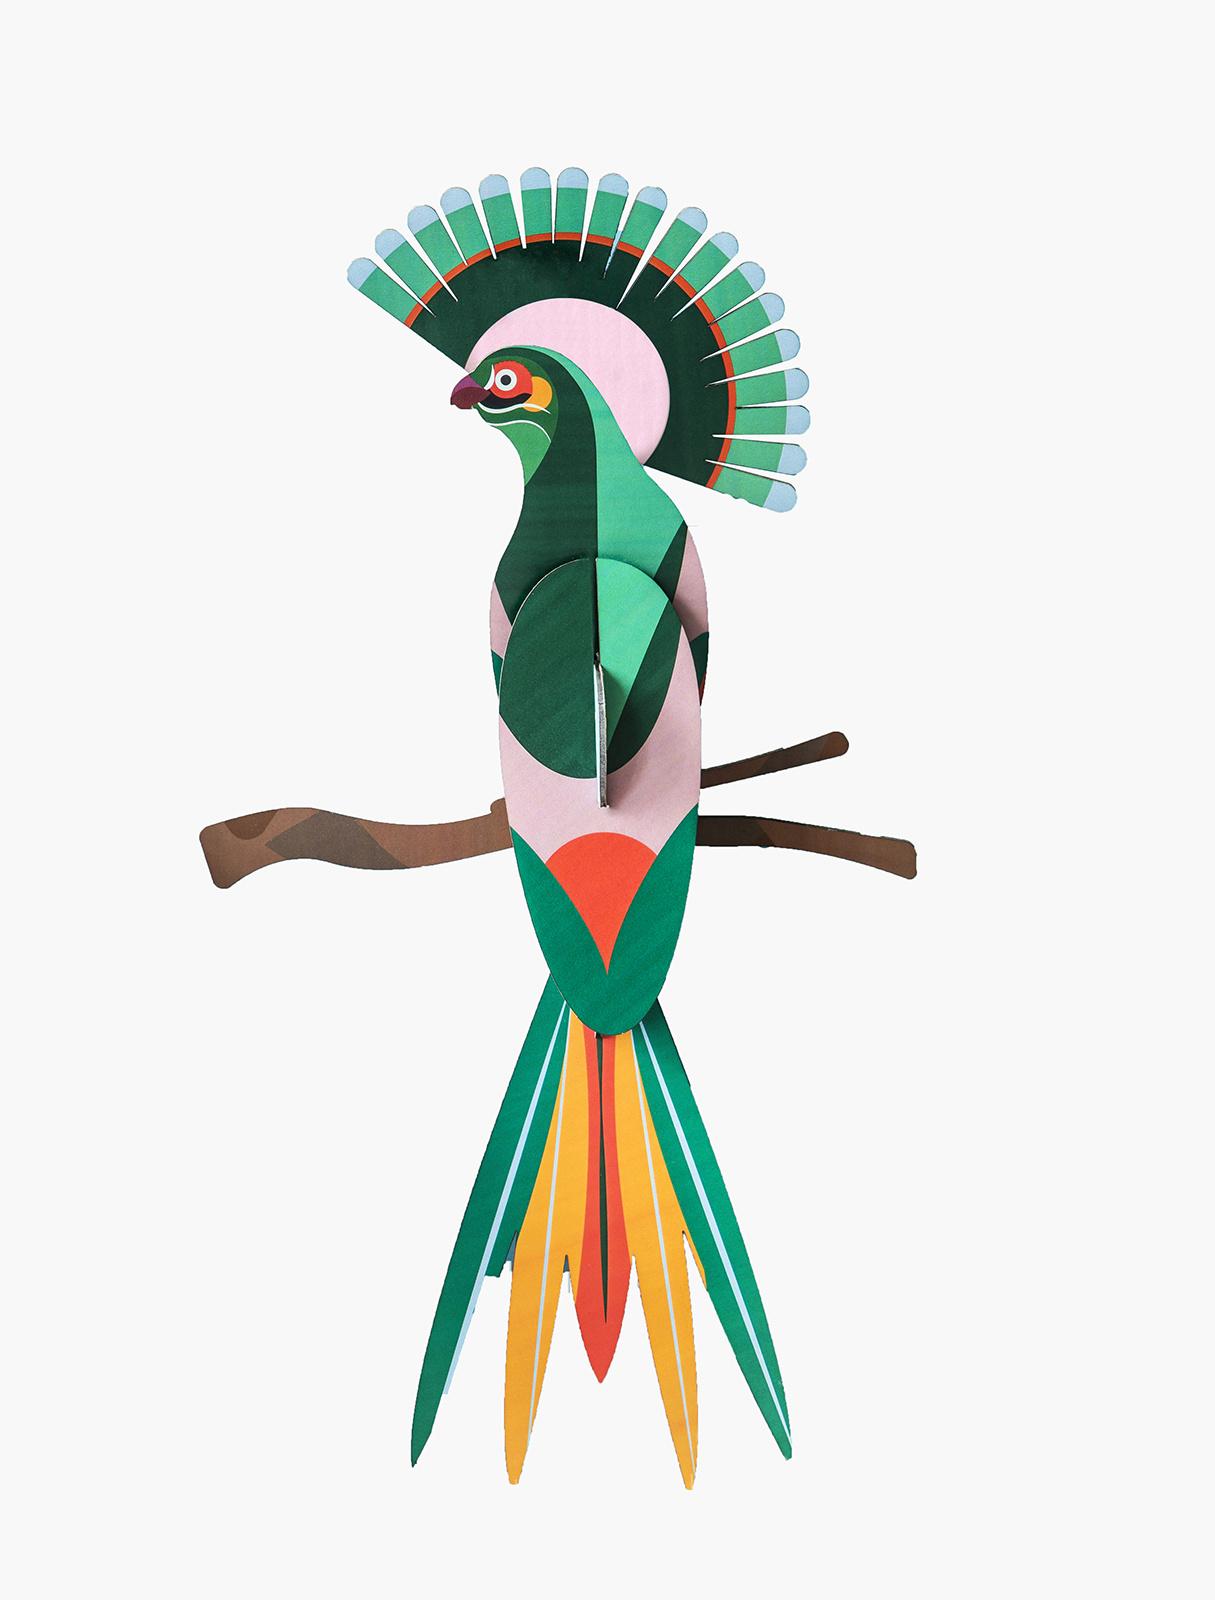 Studio Roof 3D Wanddecoratie Paradise Bird Gili